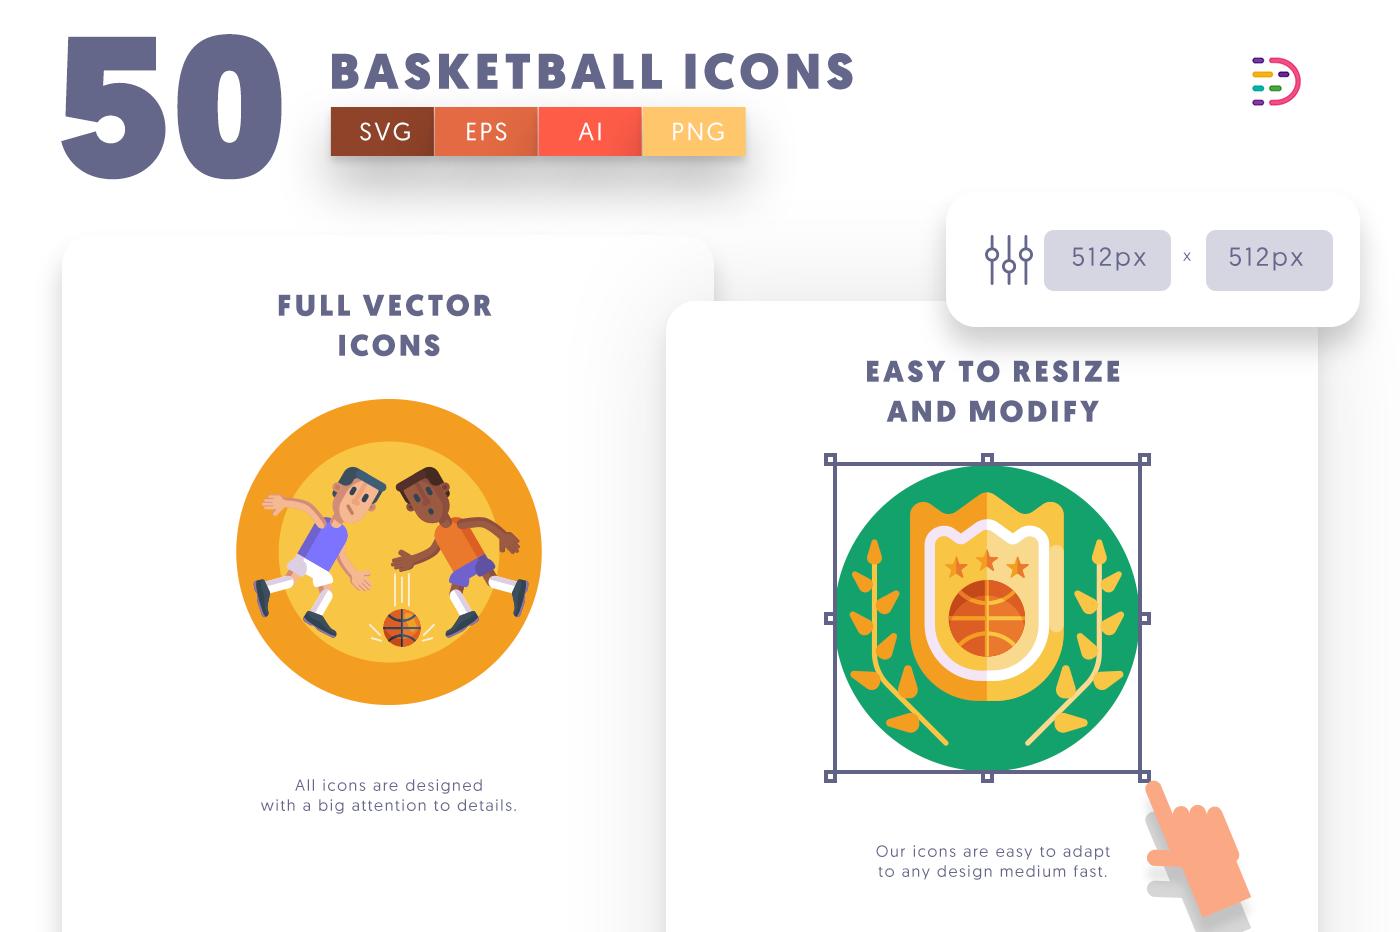 Full vector 50 Basketball Icons